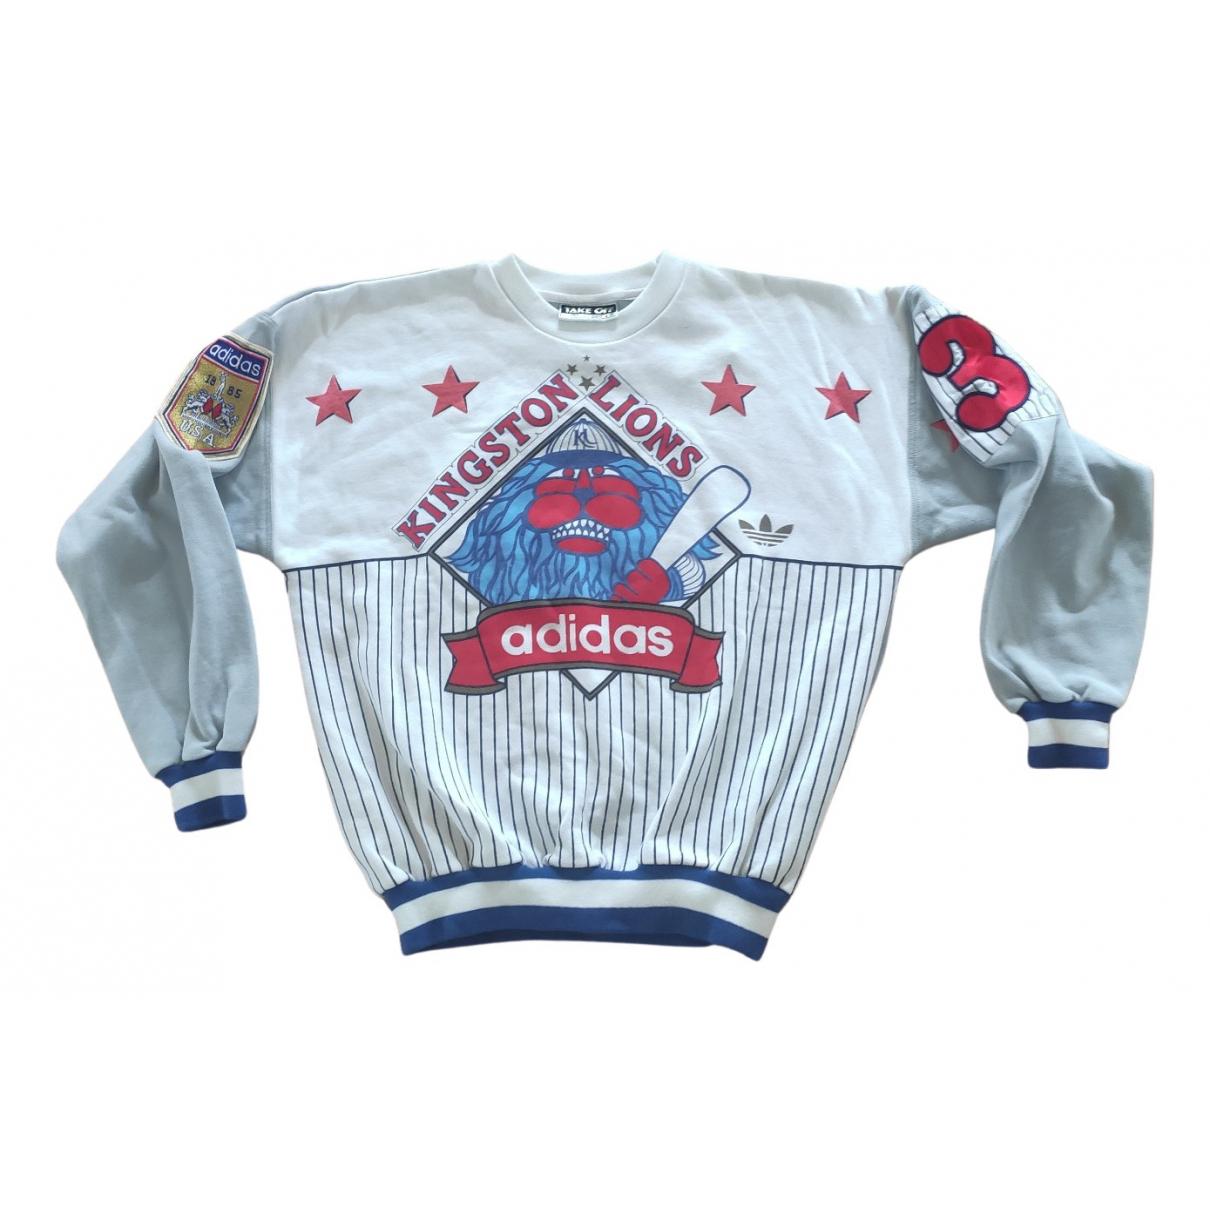 Adidas N Cotton Knitwear & Sweatshirts for Men M International